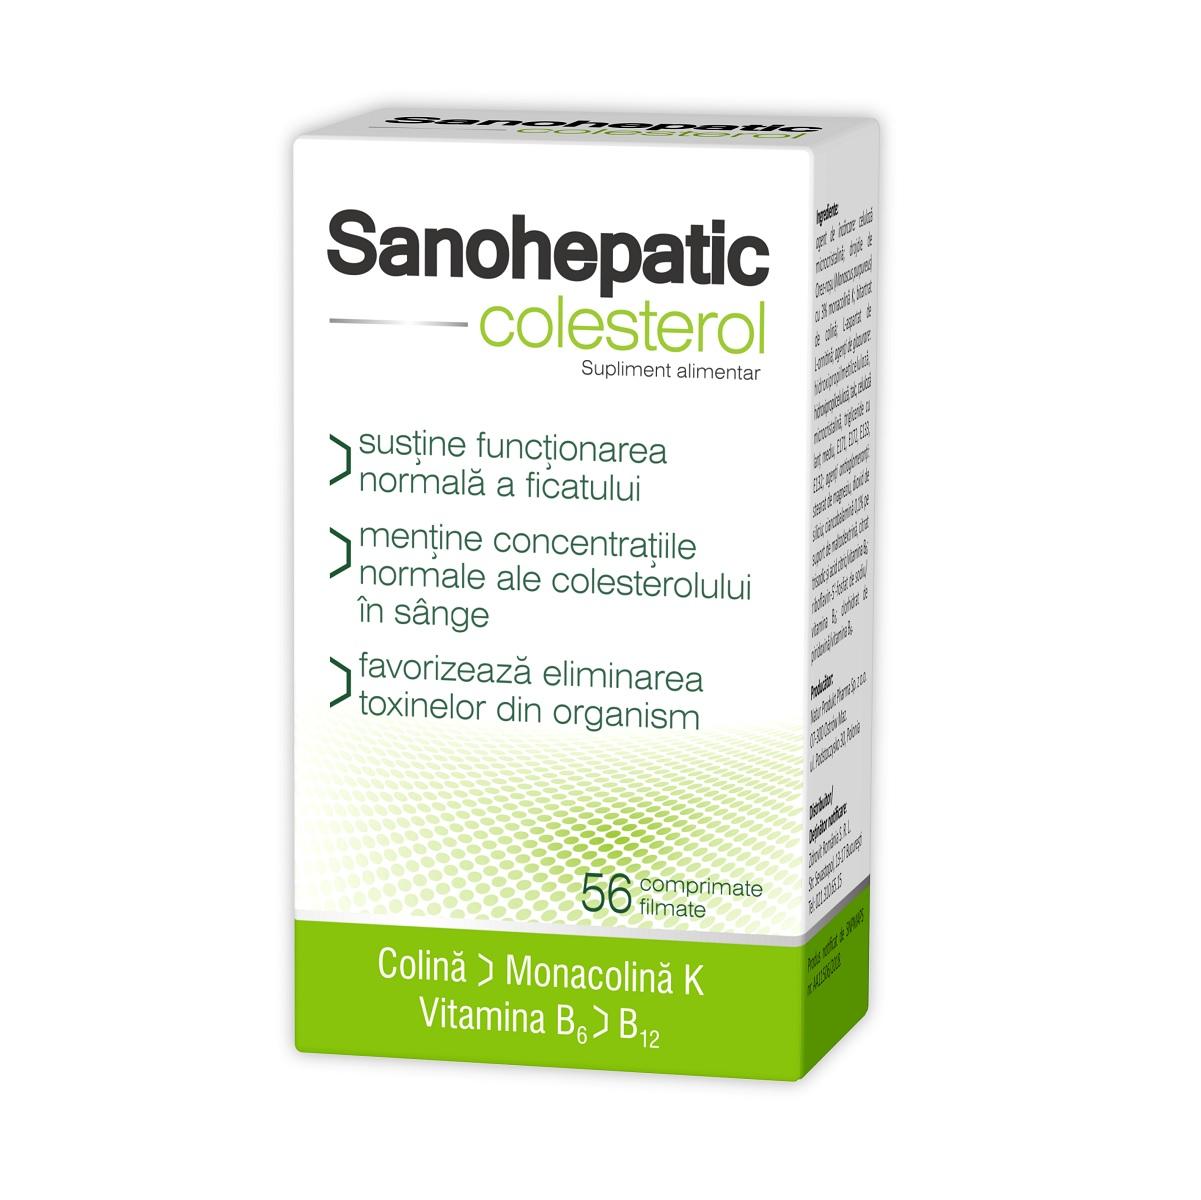 Sanohepatic Colesterol, 56 comprimate, Zdrovit imagine produs 2021